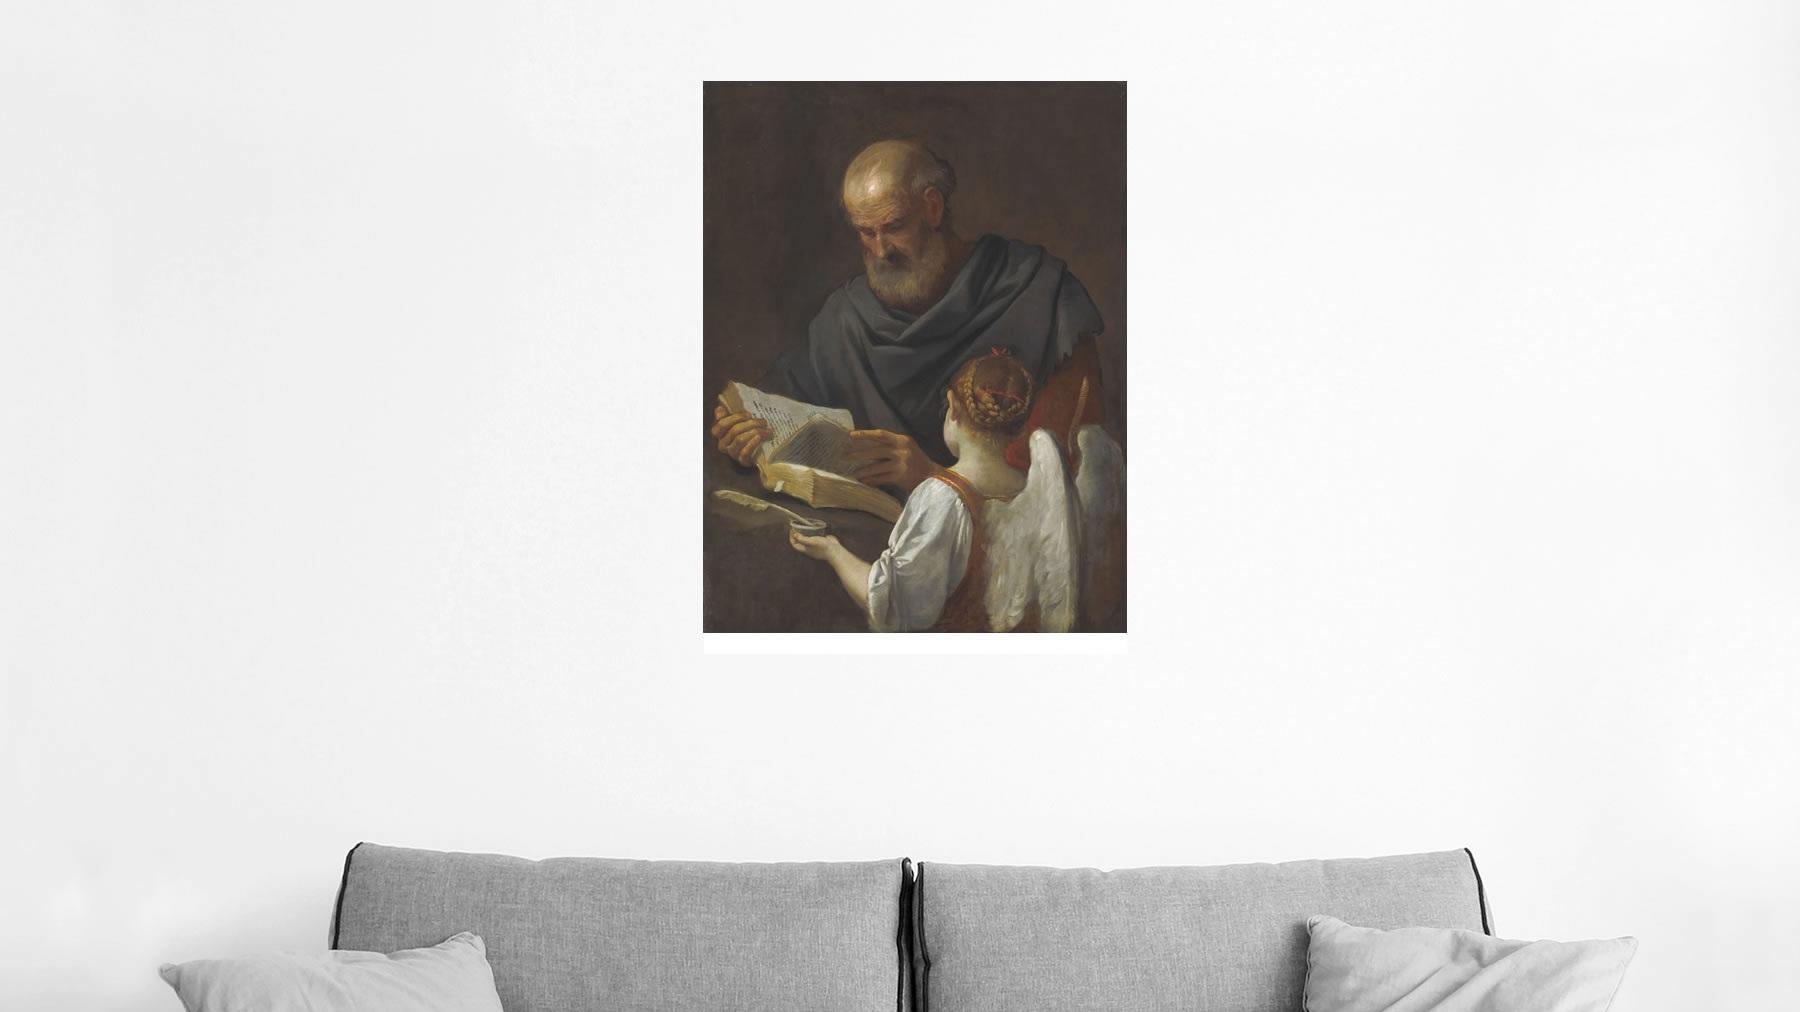 Cantarini_Saint+Matthew+and+the+Angel_18x24-poster.jpg